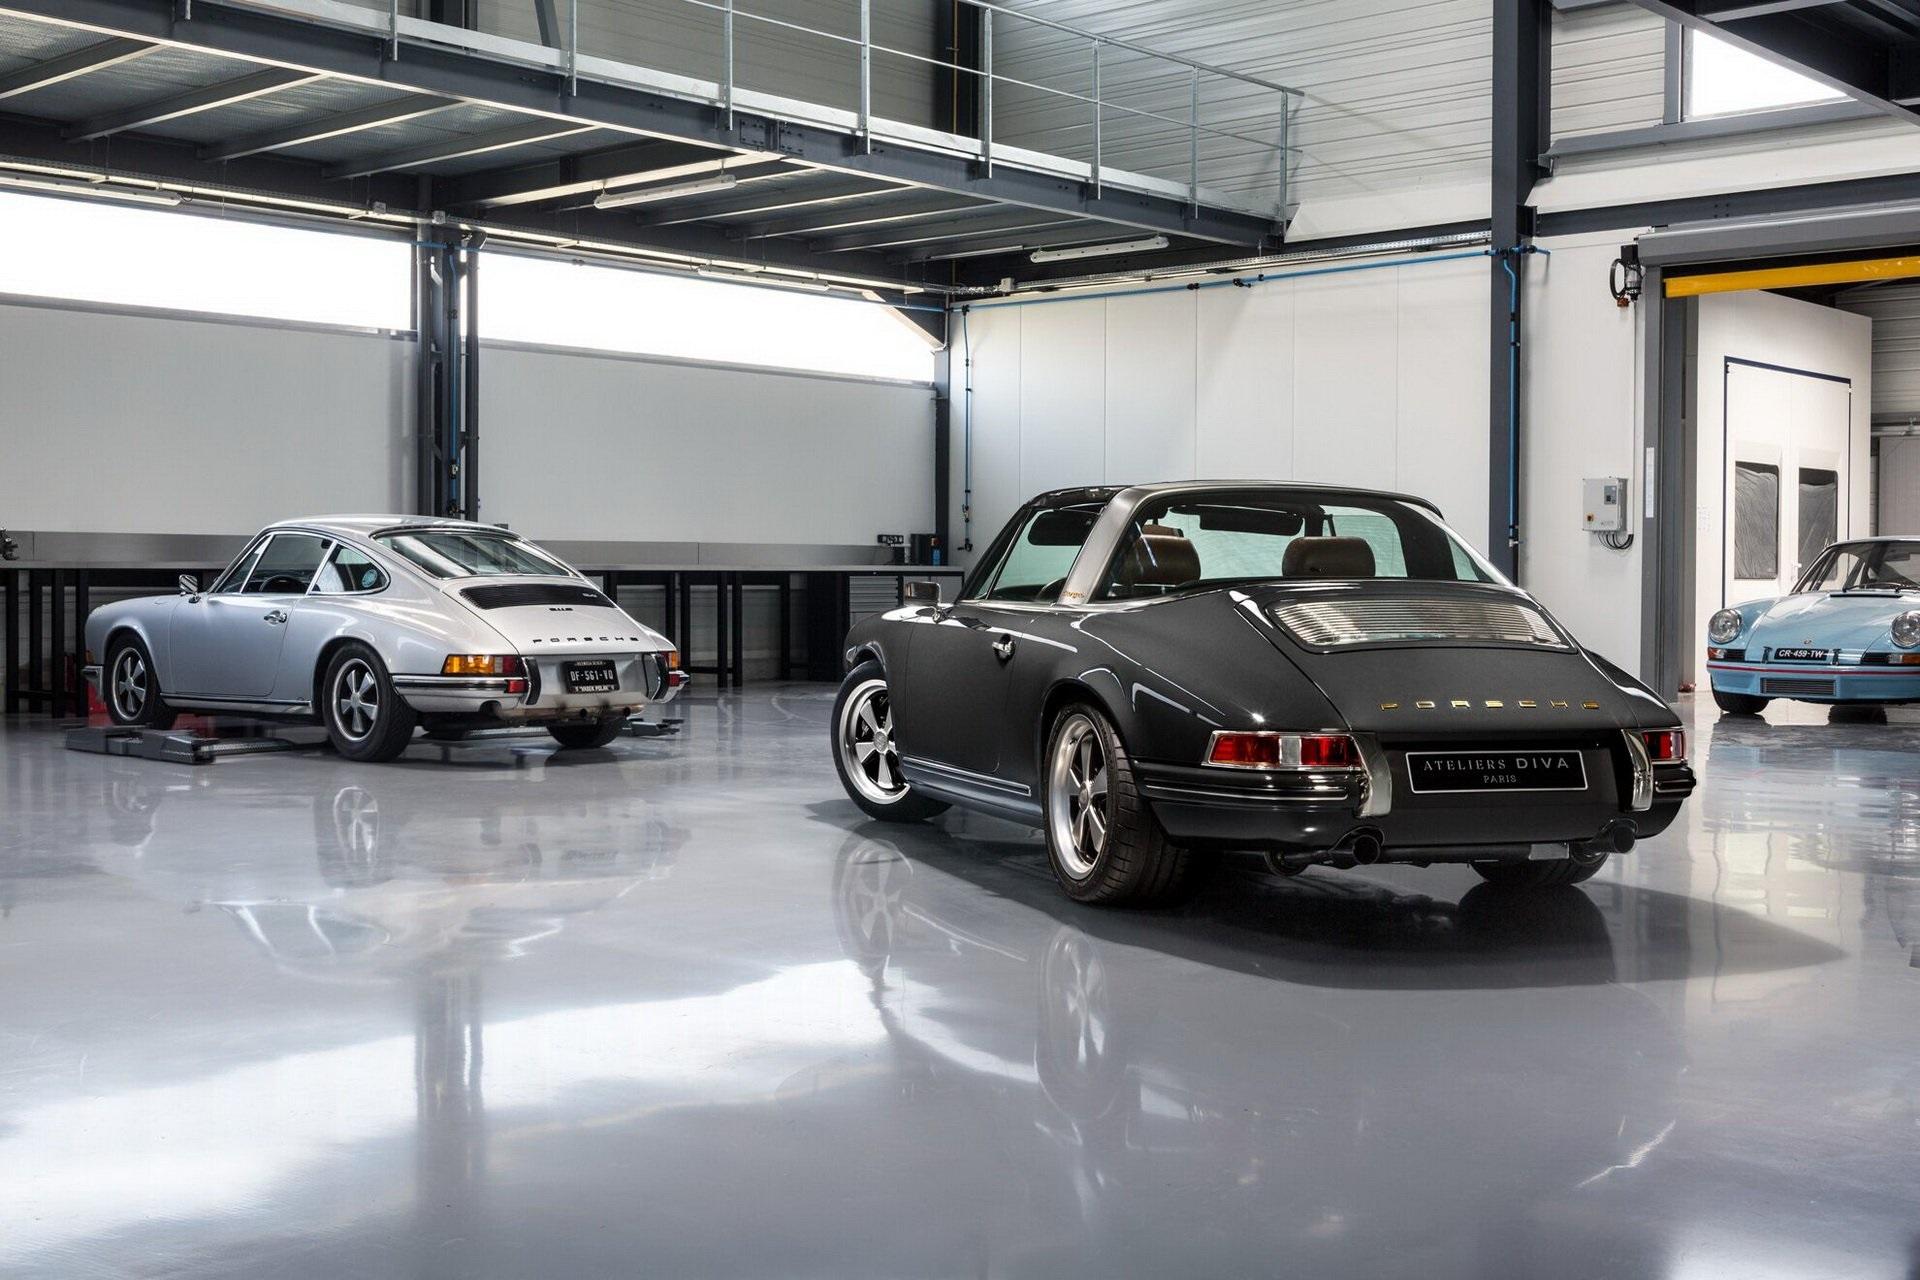 Ateliers-Diva-Porsche-911-6